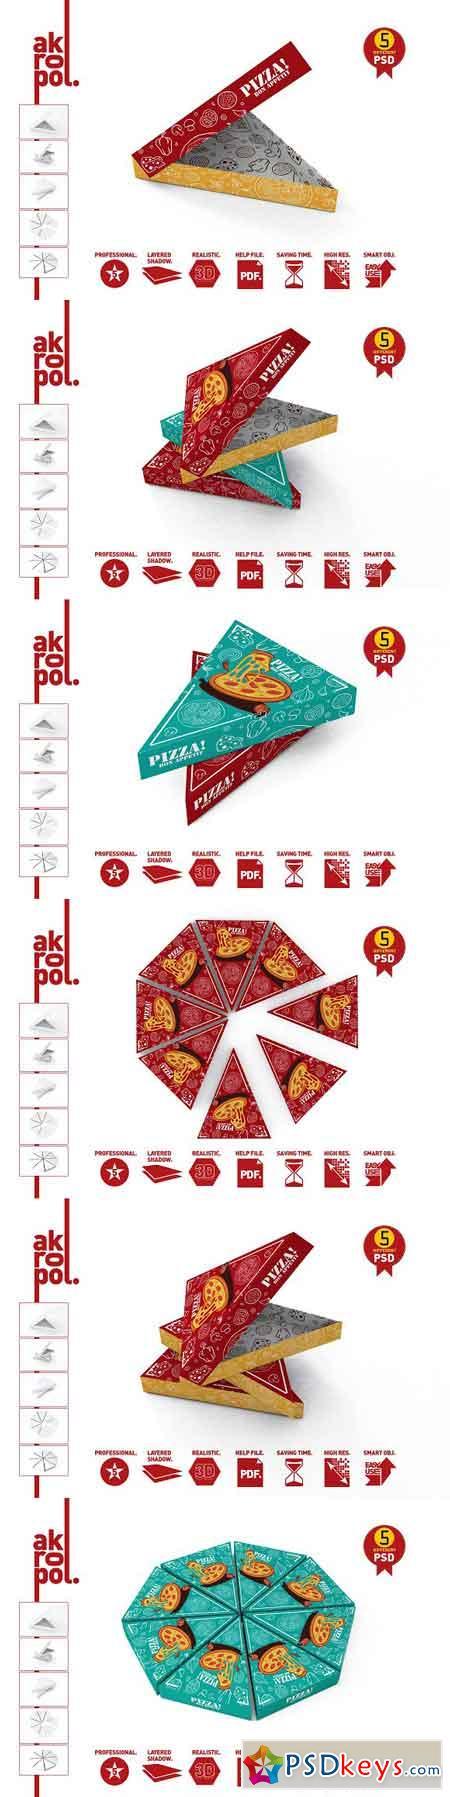 Pizza Slice Box Packaging Mockup 2758554